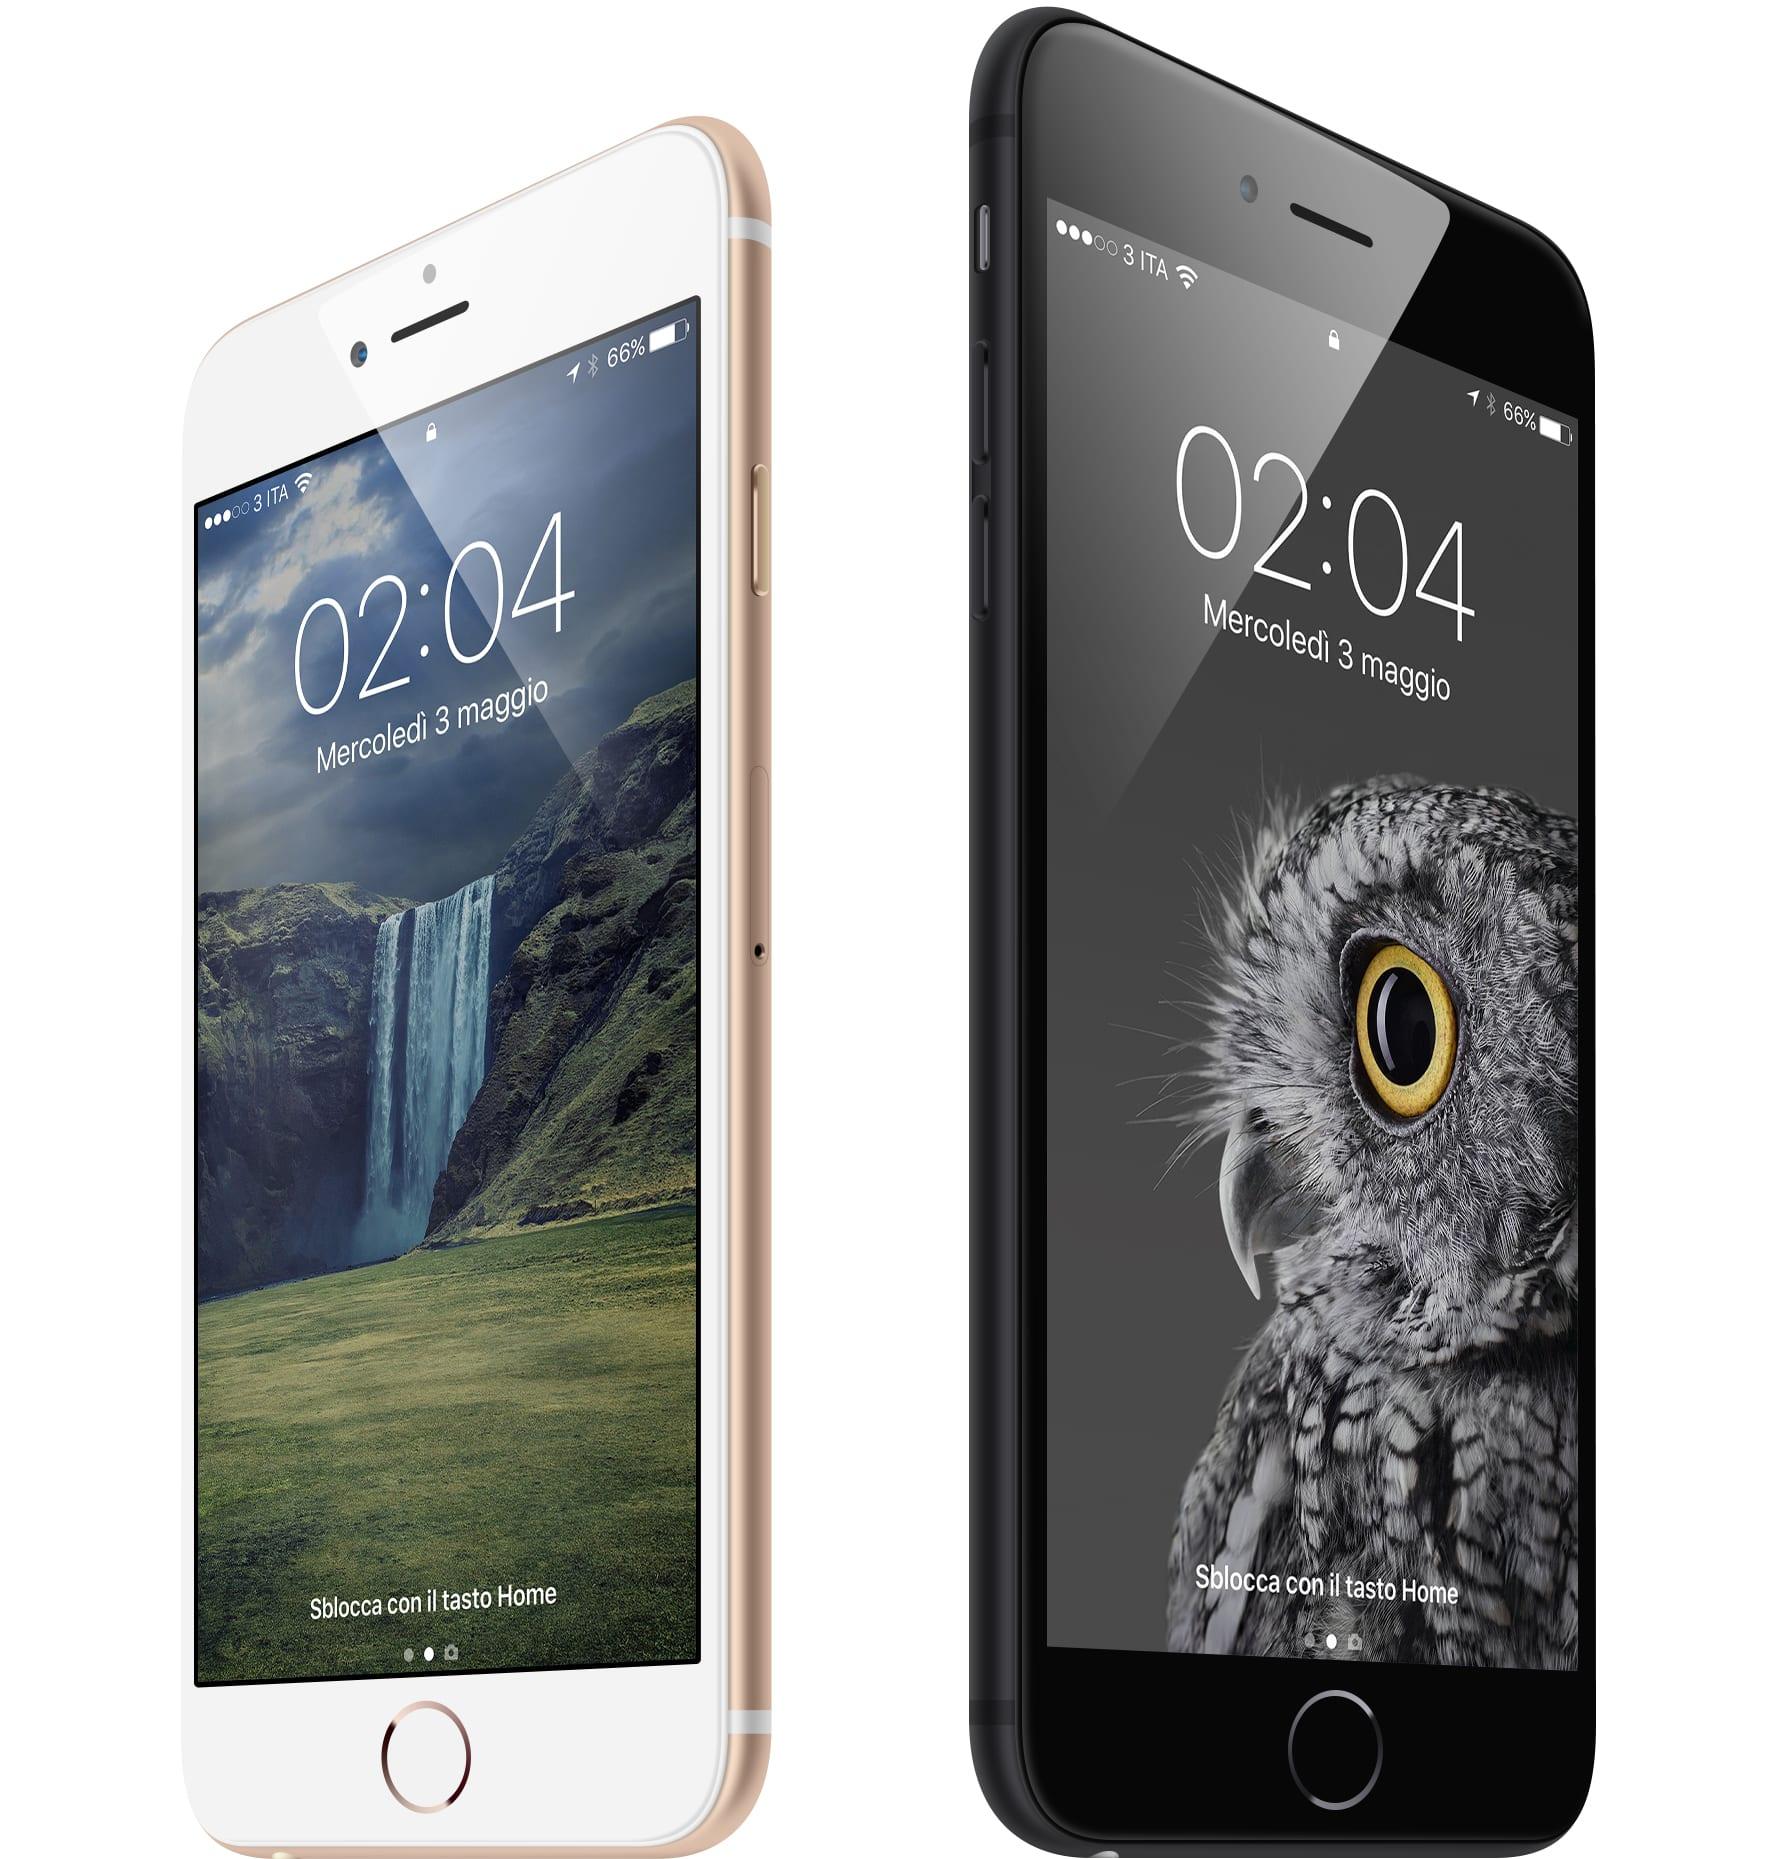 #WallpaperSelection #122: Scarica Gratis i nuovi Sfondi per iPhone ed iPad